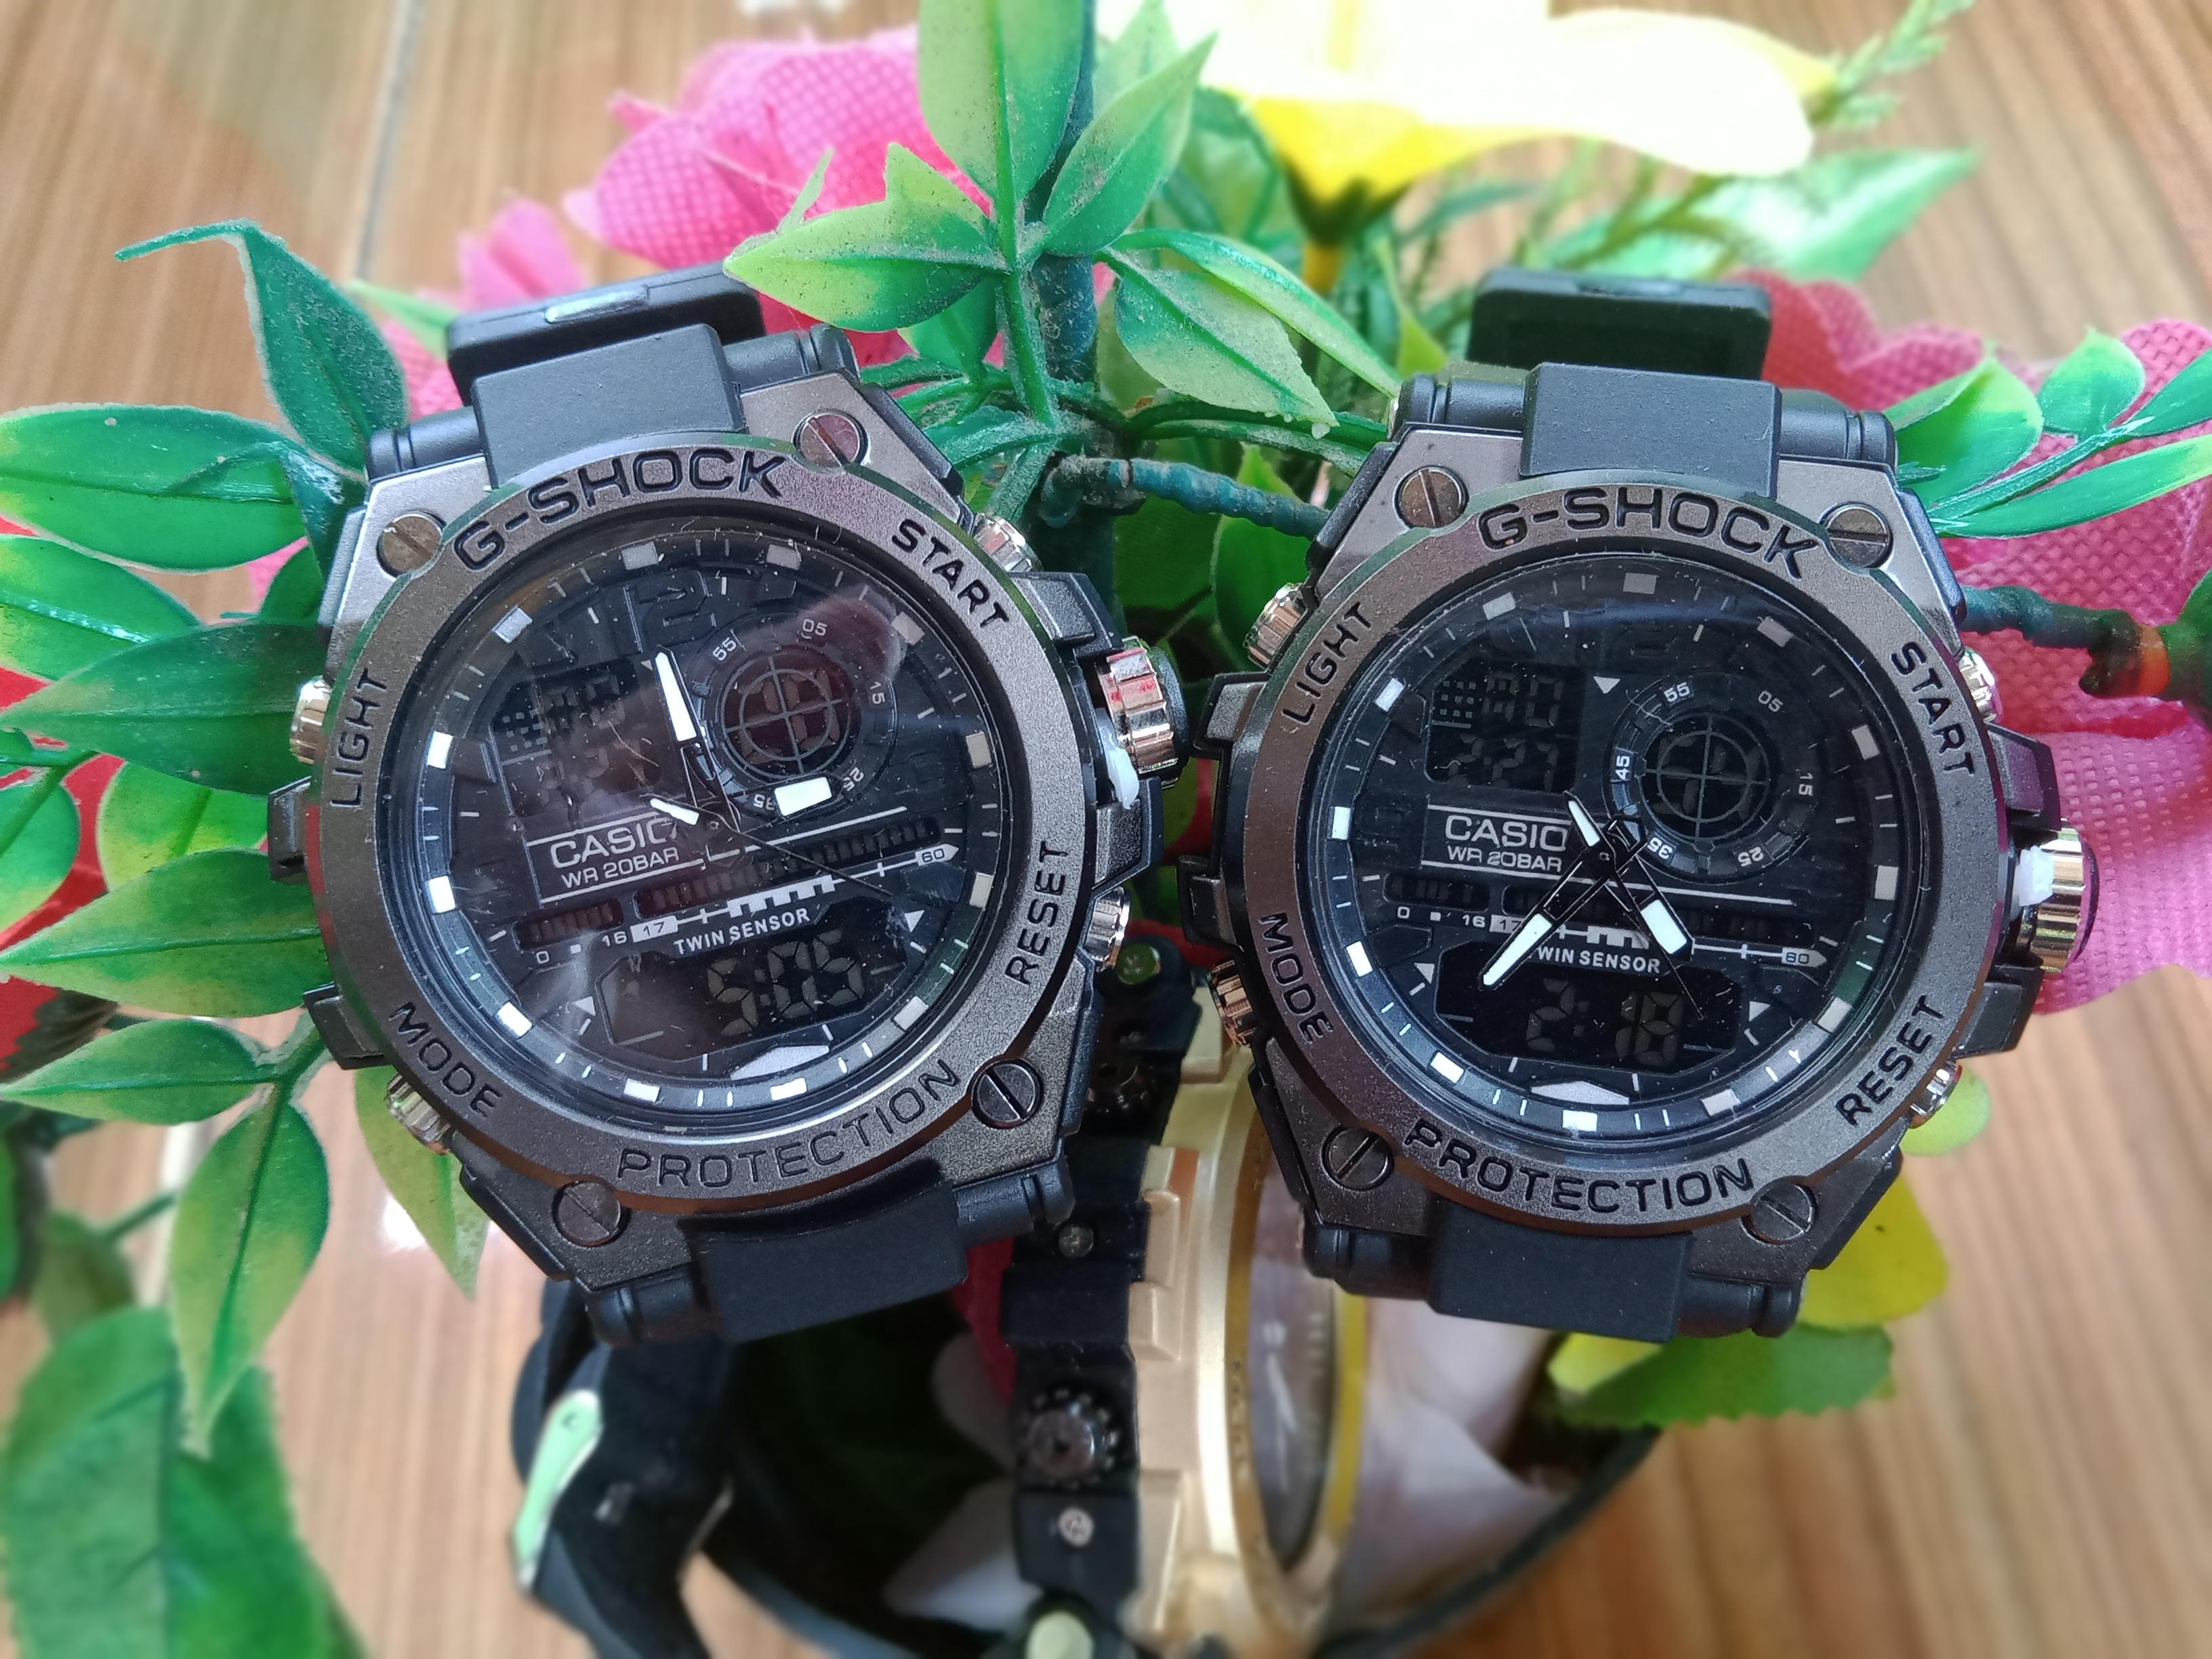 Jam Tangan G shock Dual time